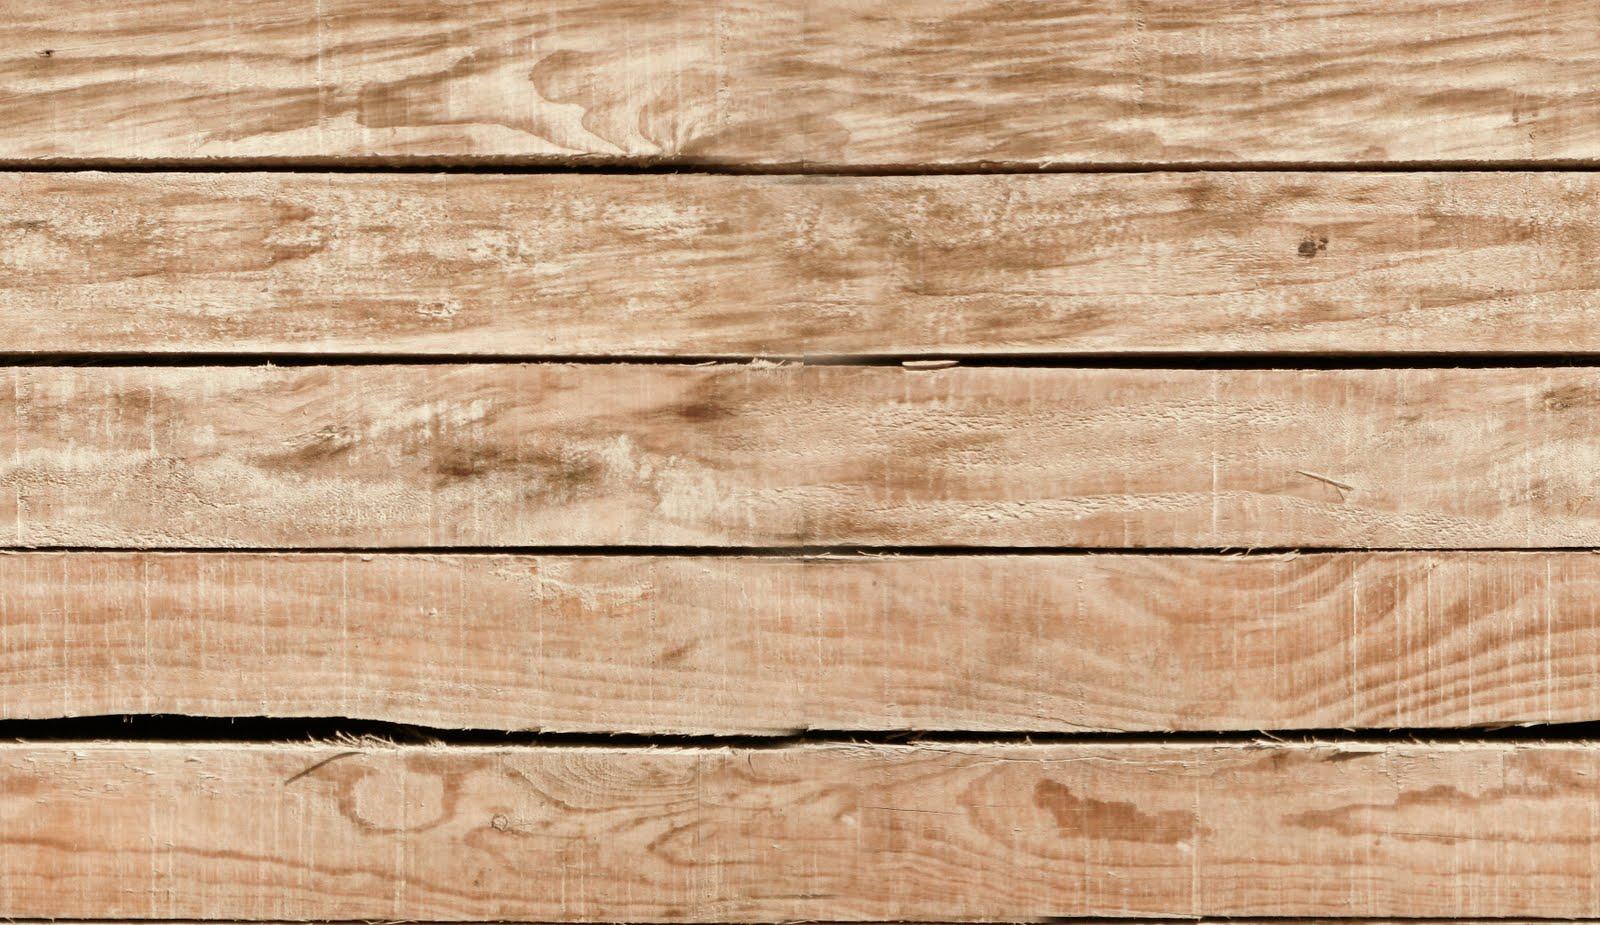 Creative mindly fondos de madera para tus dise os o lo - Maderas menur ...